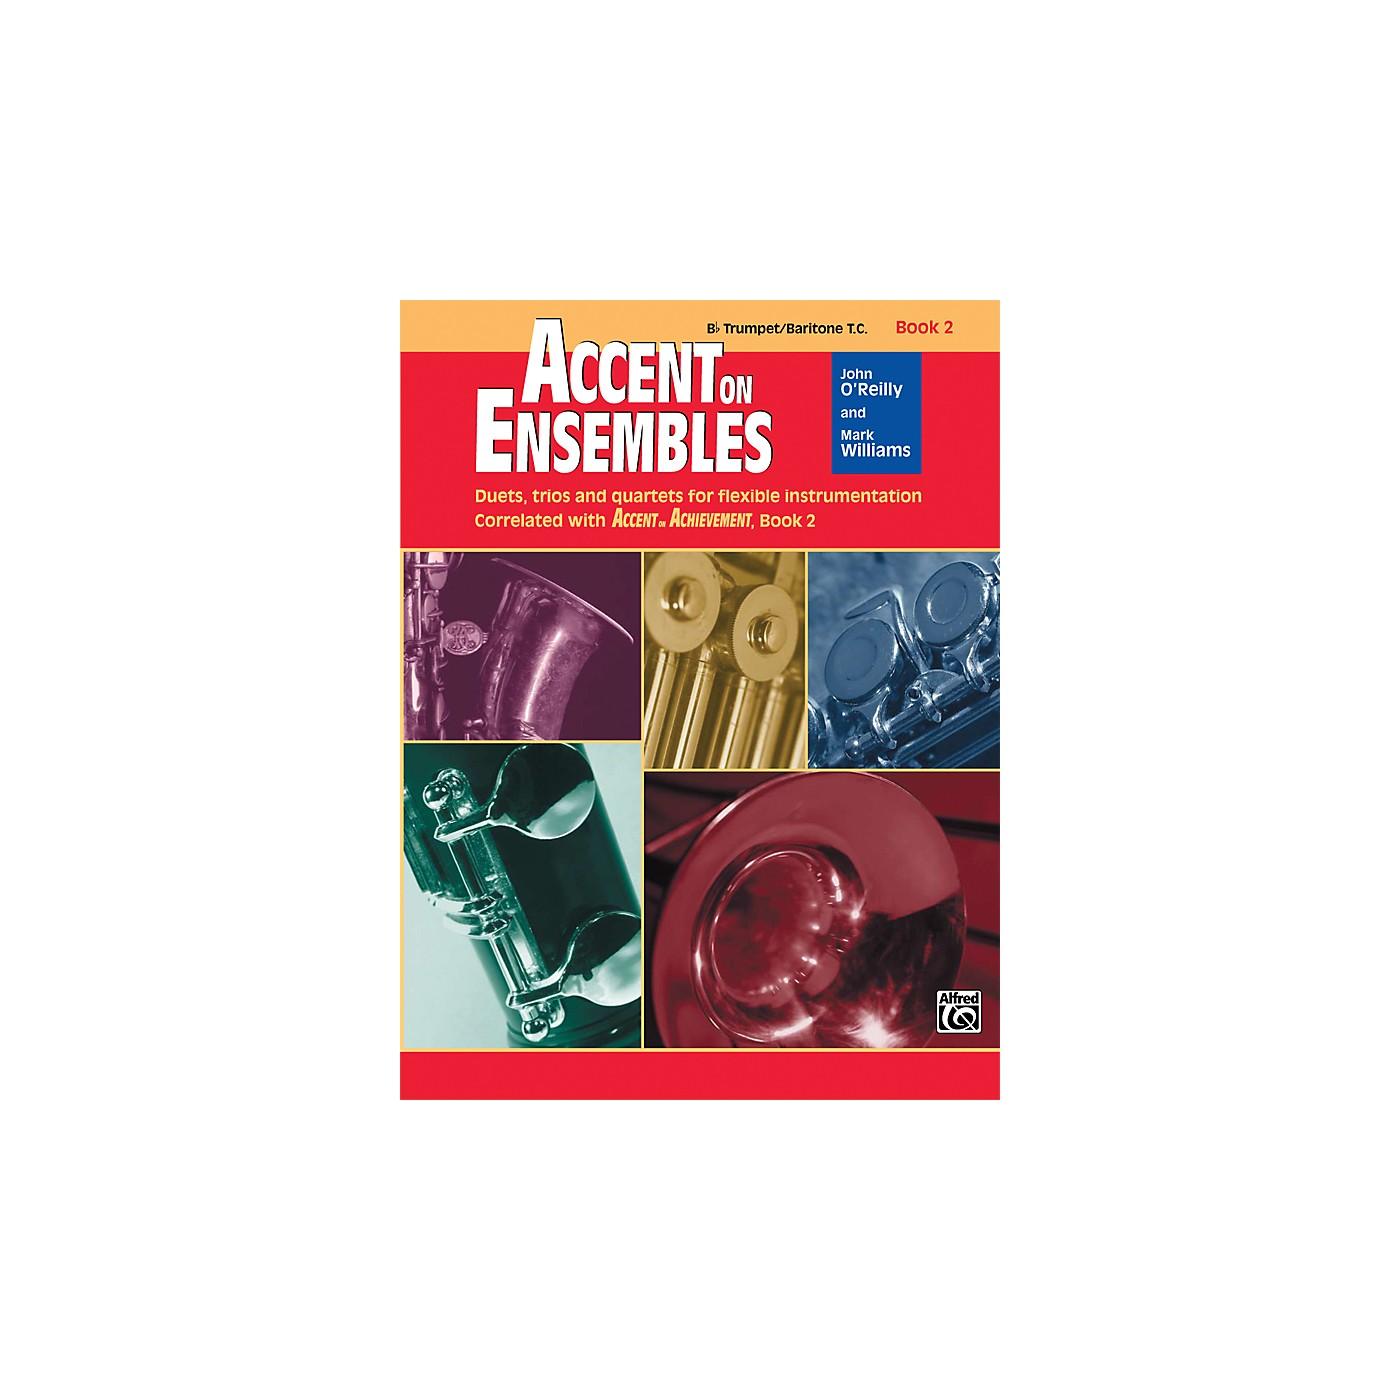 Alfred Accent on Ensembles Book 2 B-Flat Trumpet/Baritone T.C. thumbnail